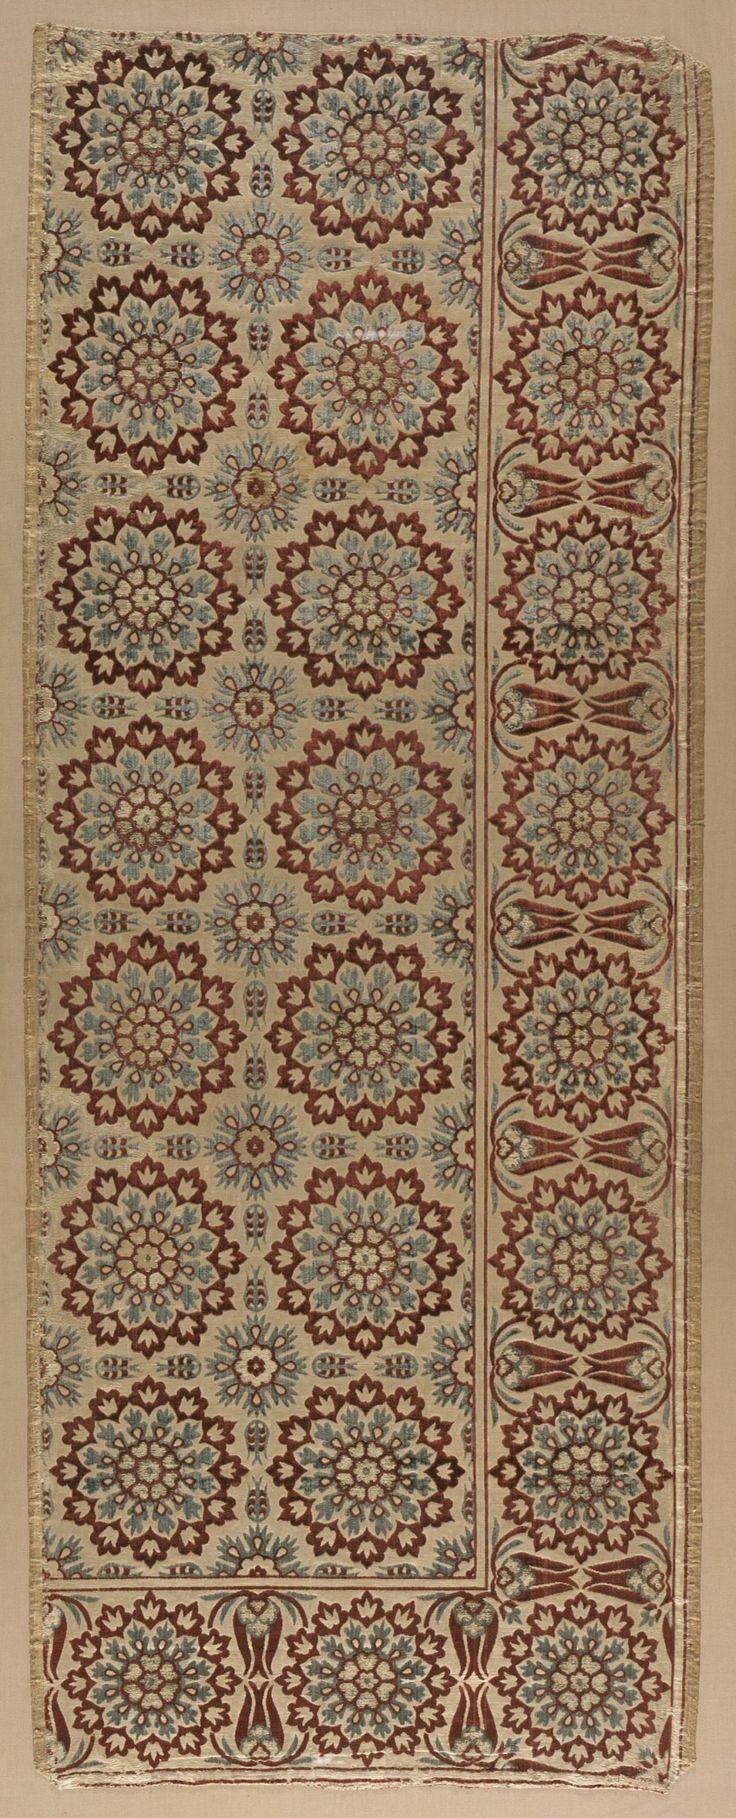 Section of a Velvet Floor Covering (çatma Nihale) Turkey, Bursa or Istanbul, Ottoman period, circa 1650 Textiles; carpets